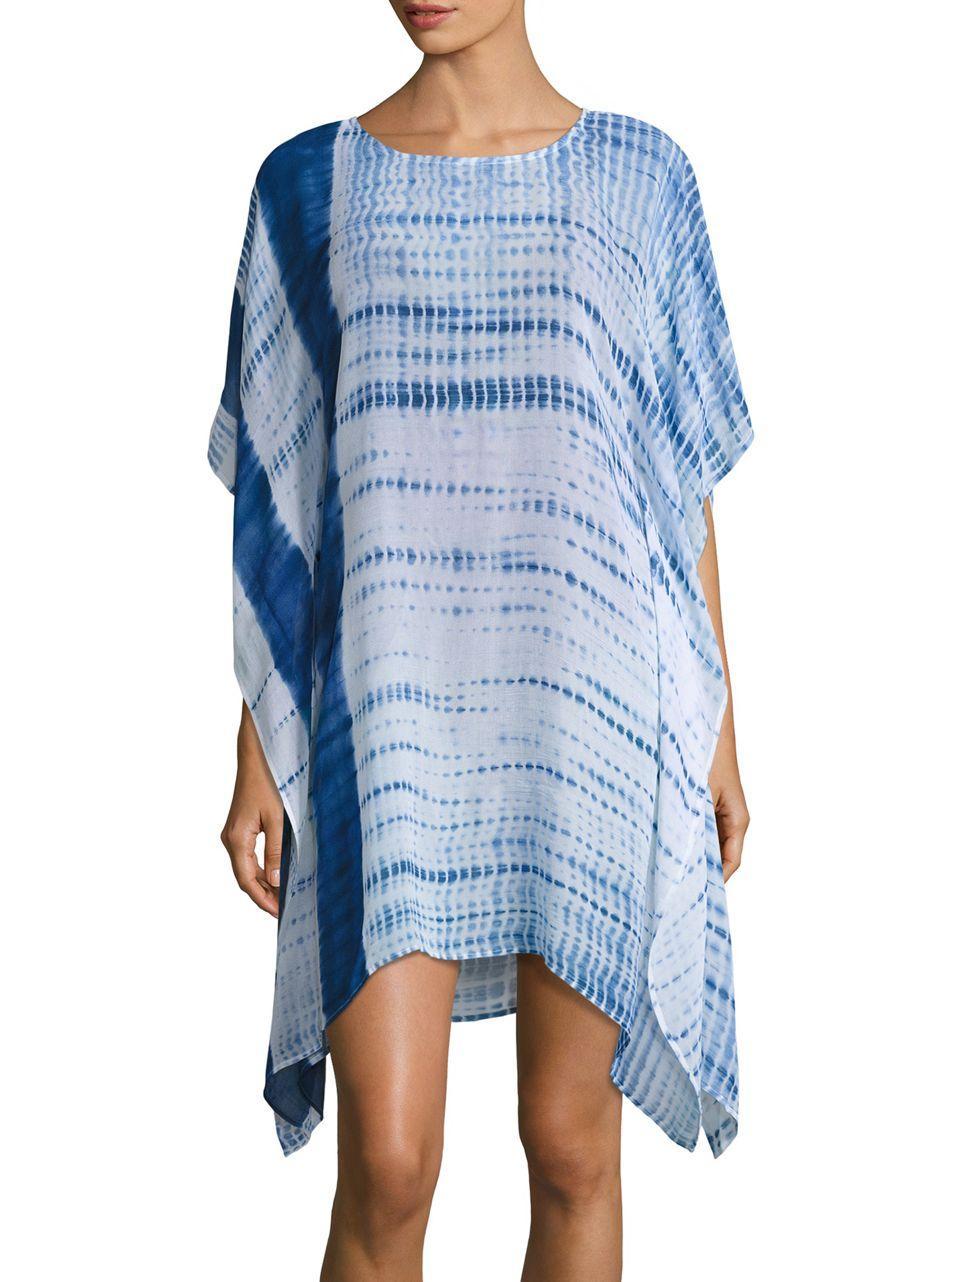 Amita naithani Tie-dye Cover-up Caftan in Blue | Lyst